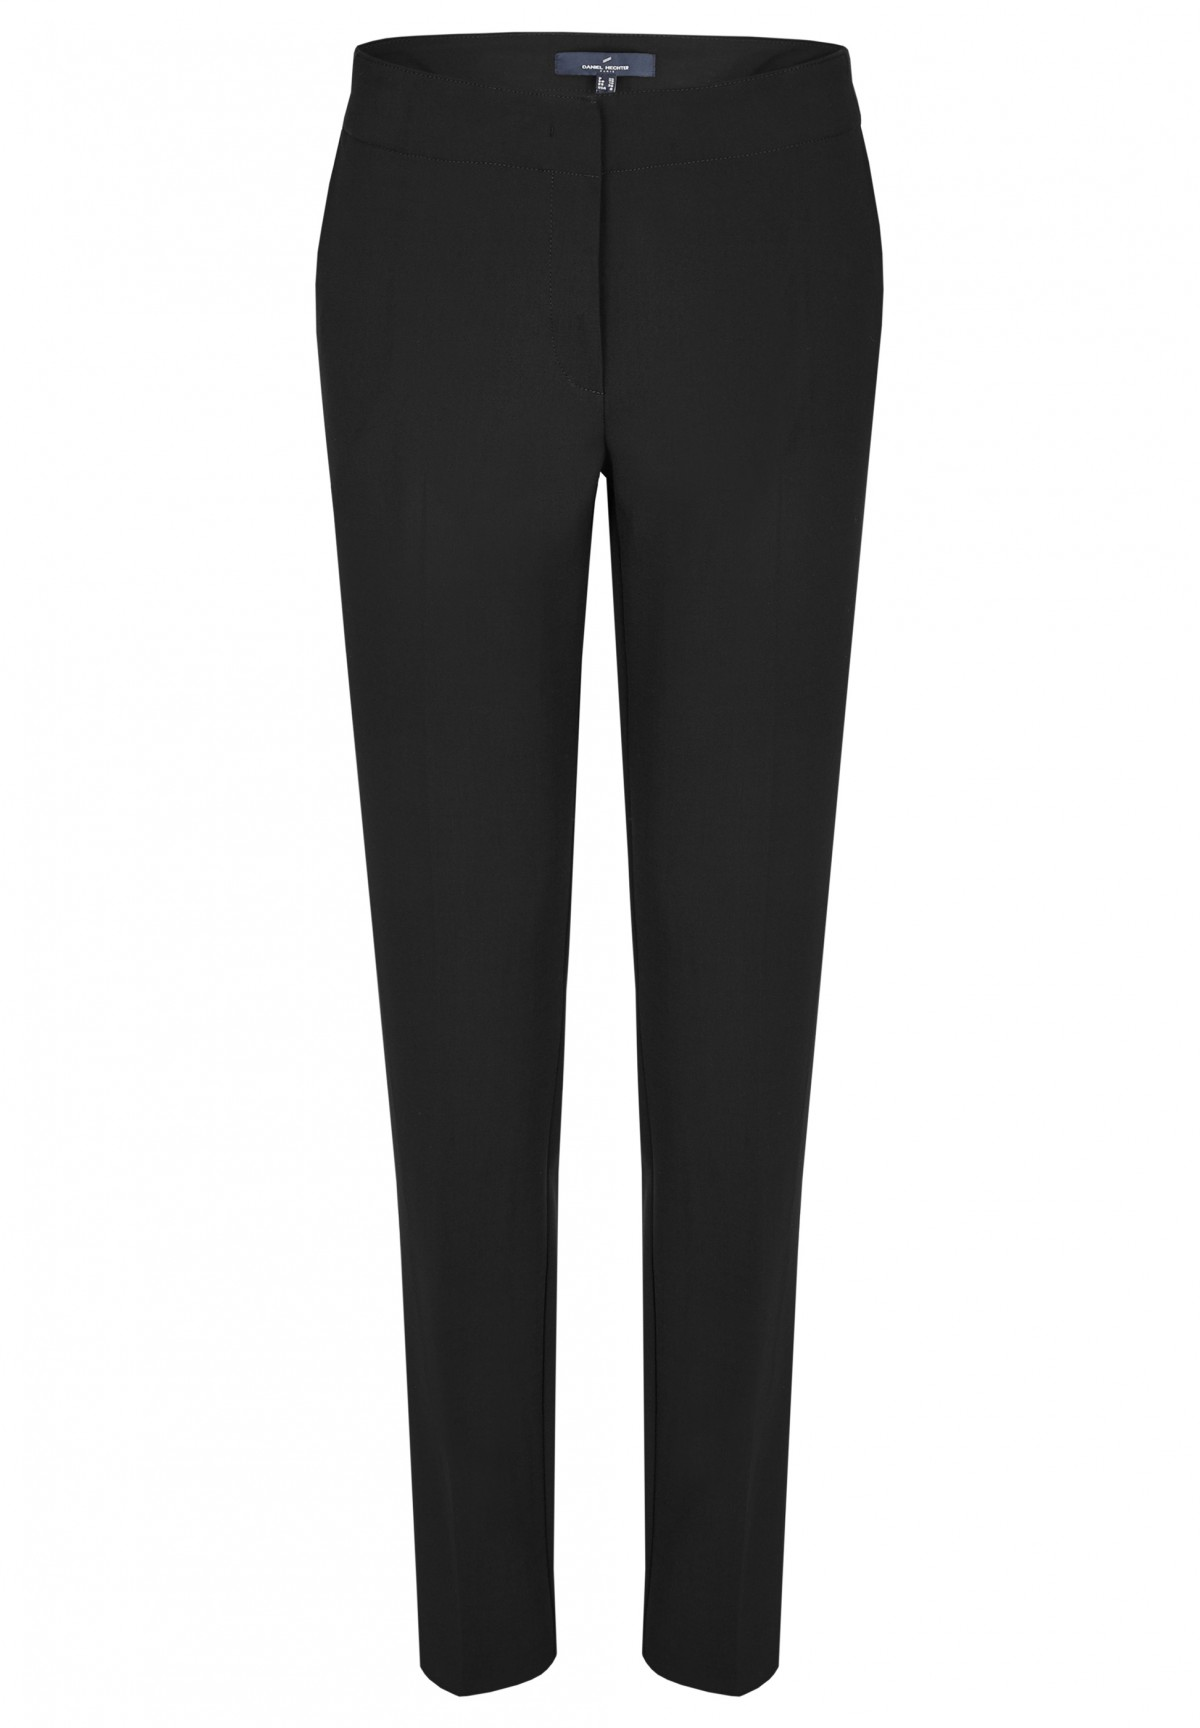 Klassische Bundfaltenhose / Klassische Bundfaltenhose